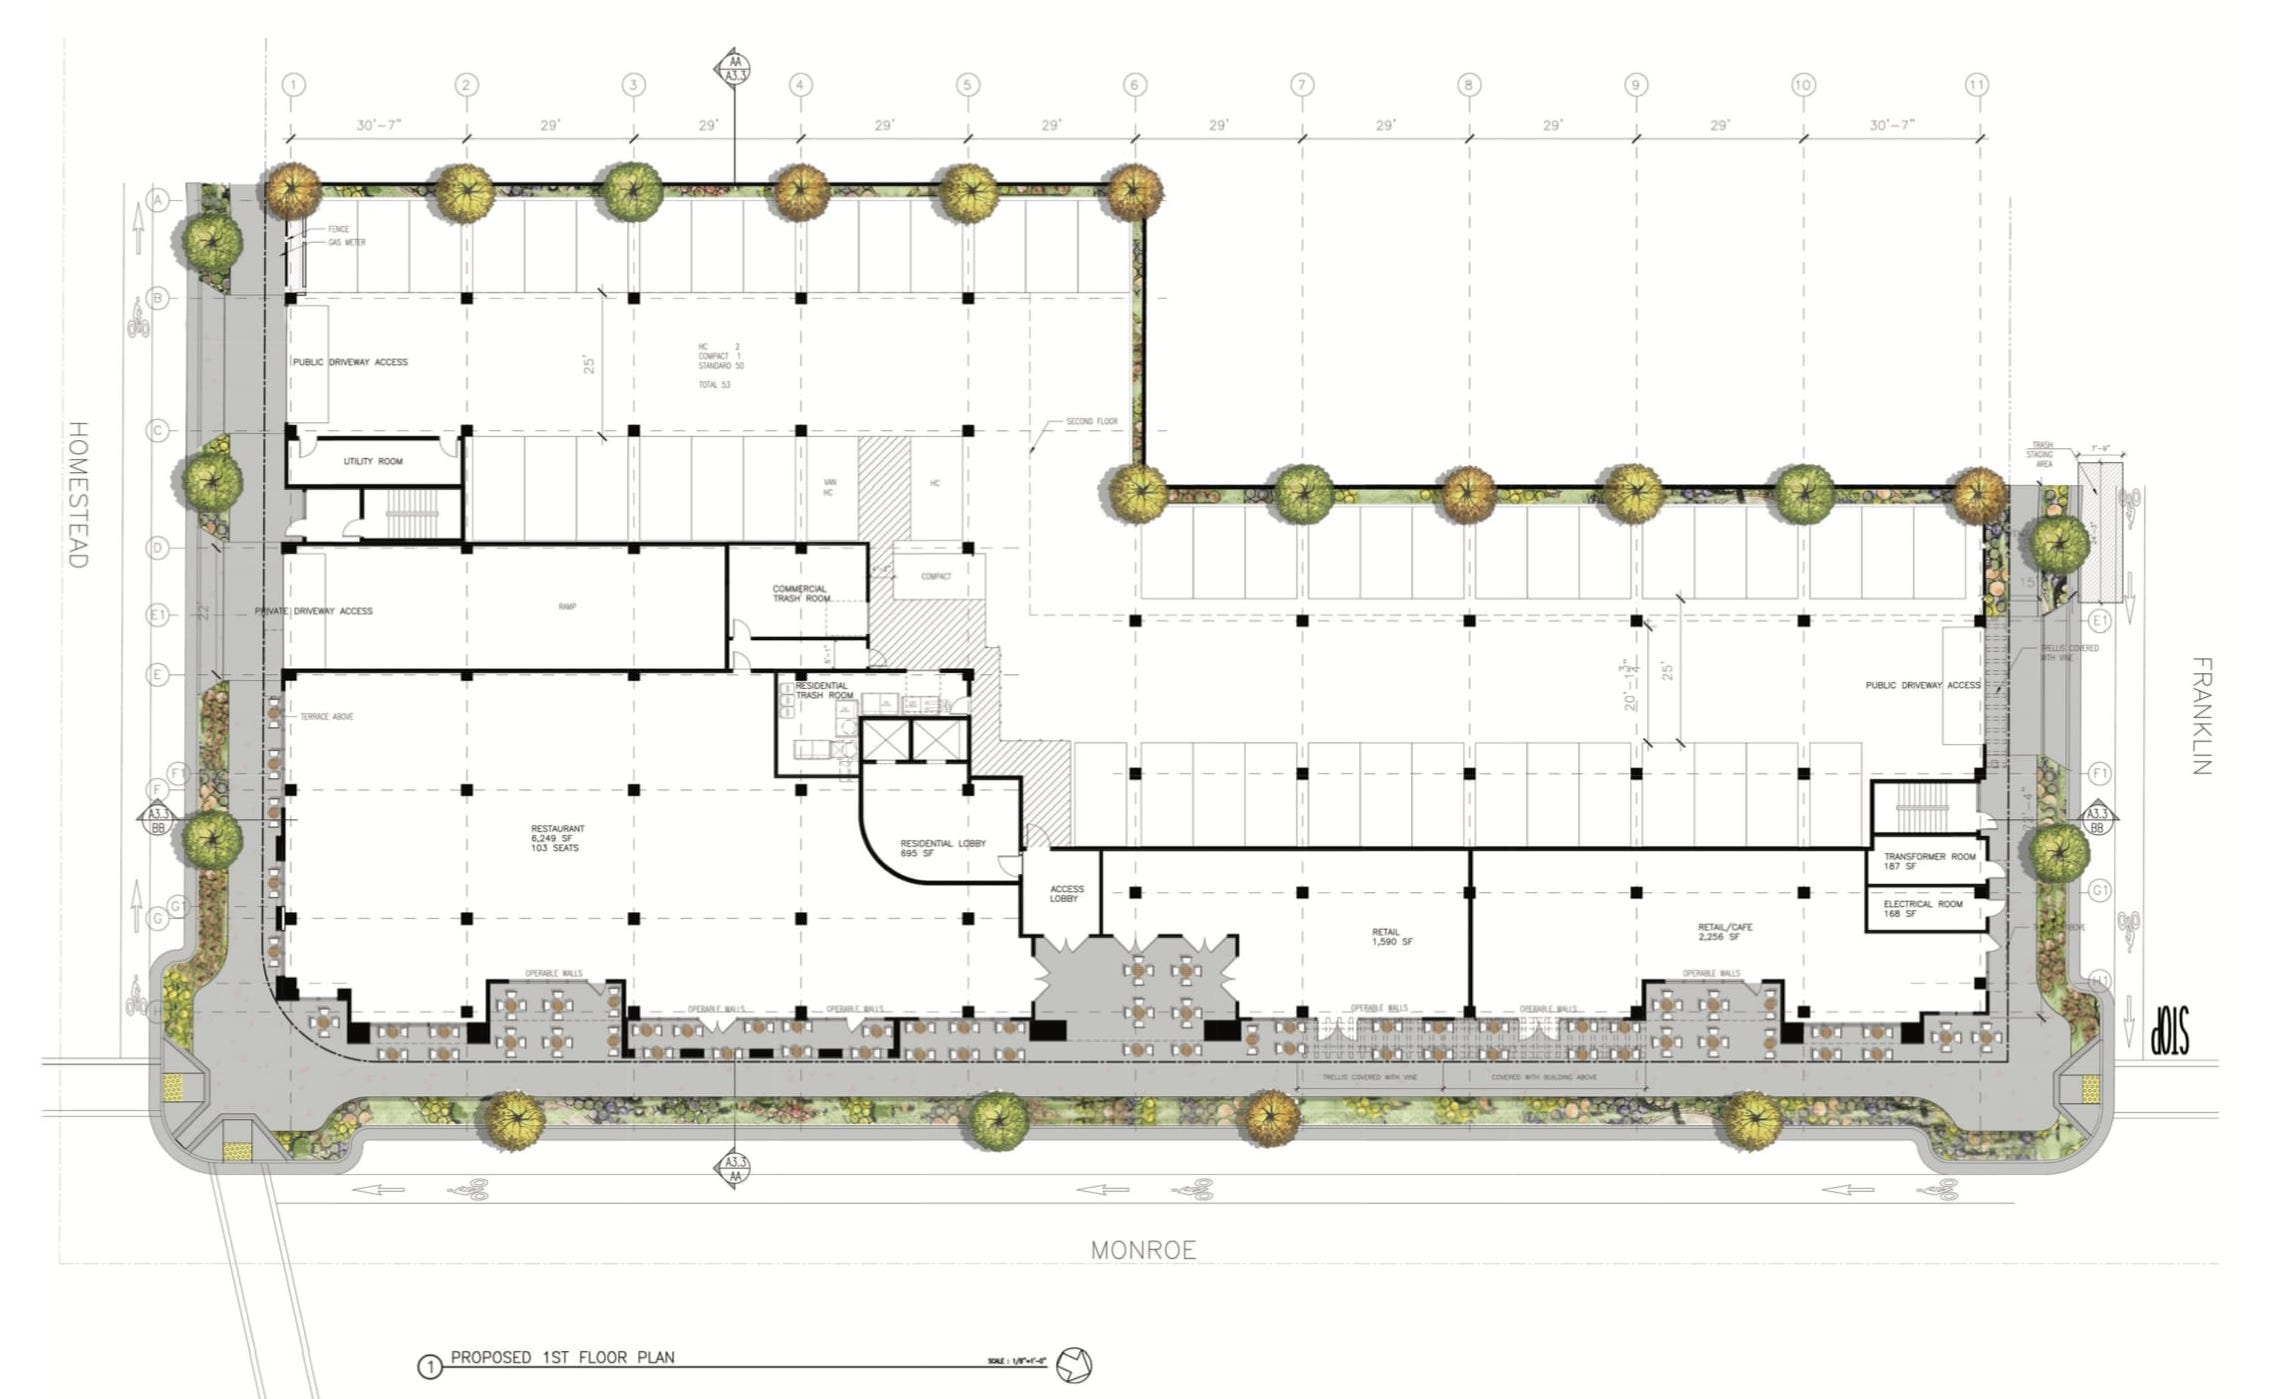 906 Monroe Street First Floor Plan